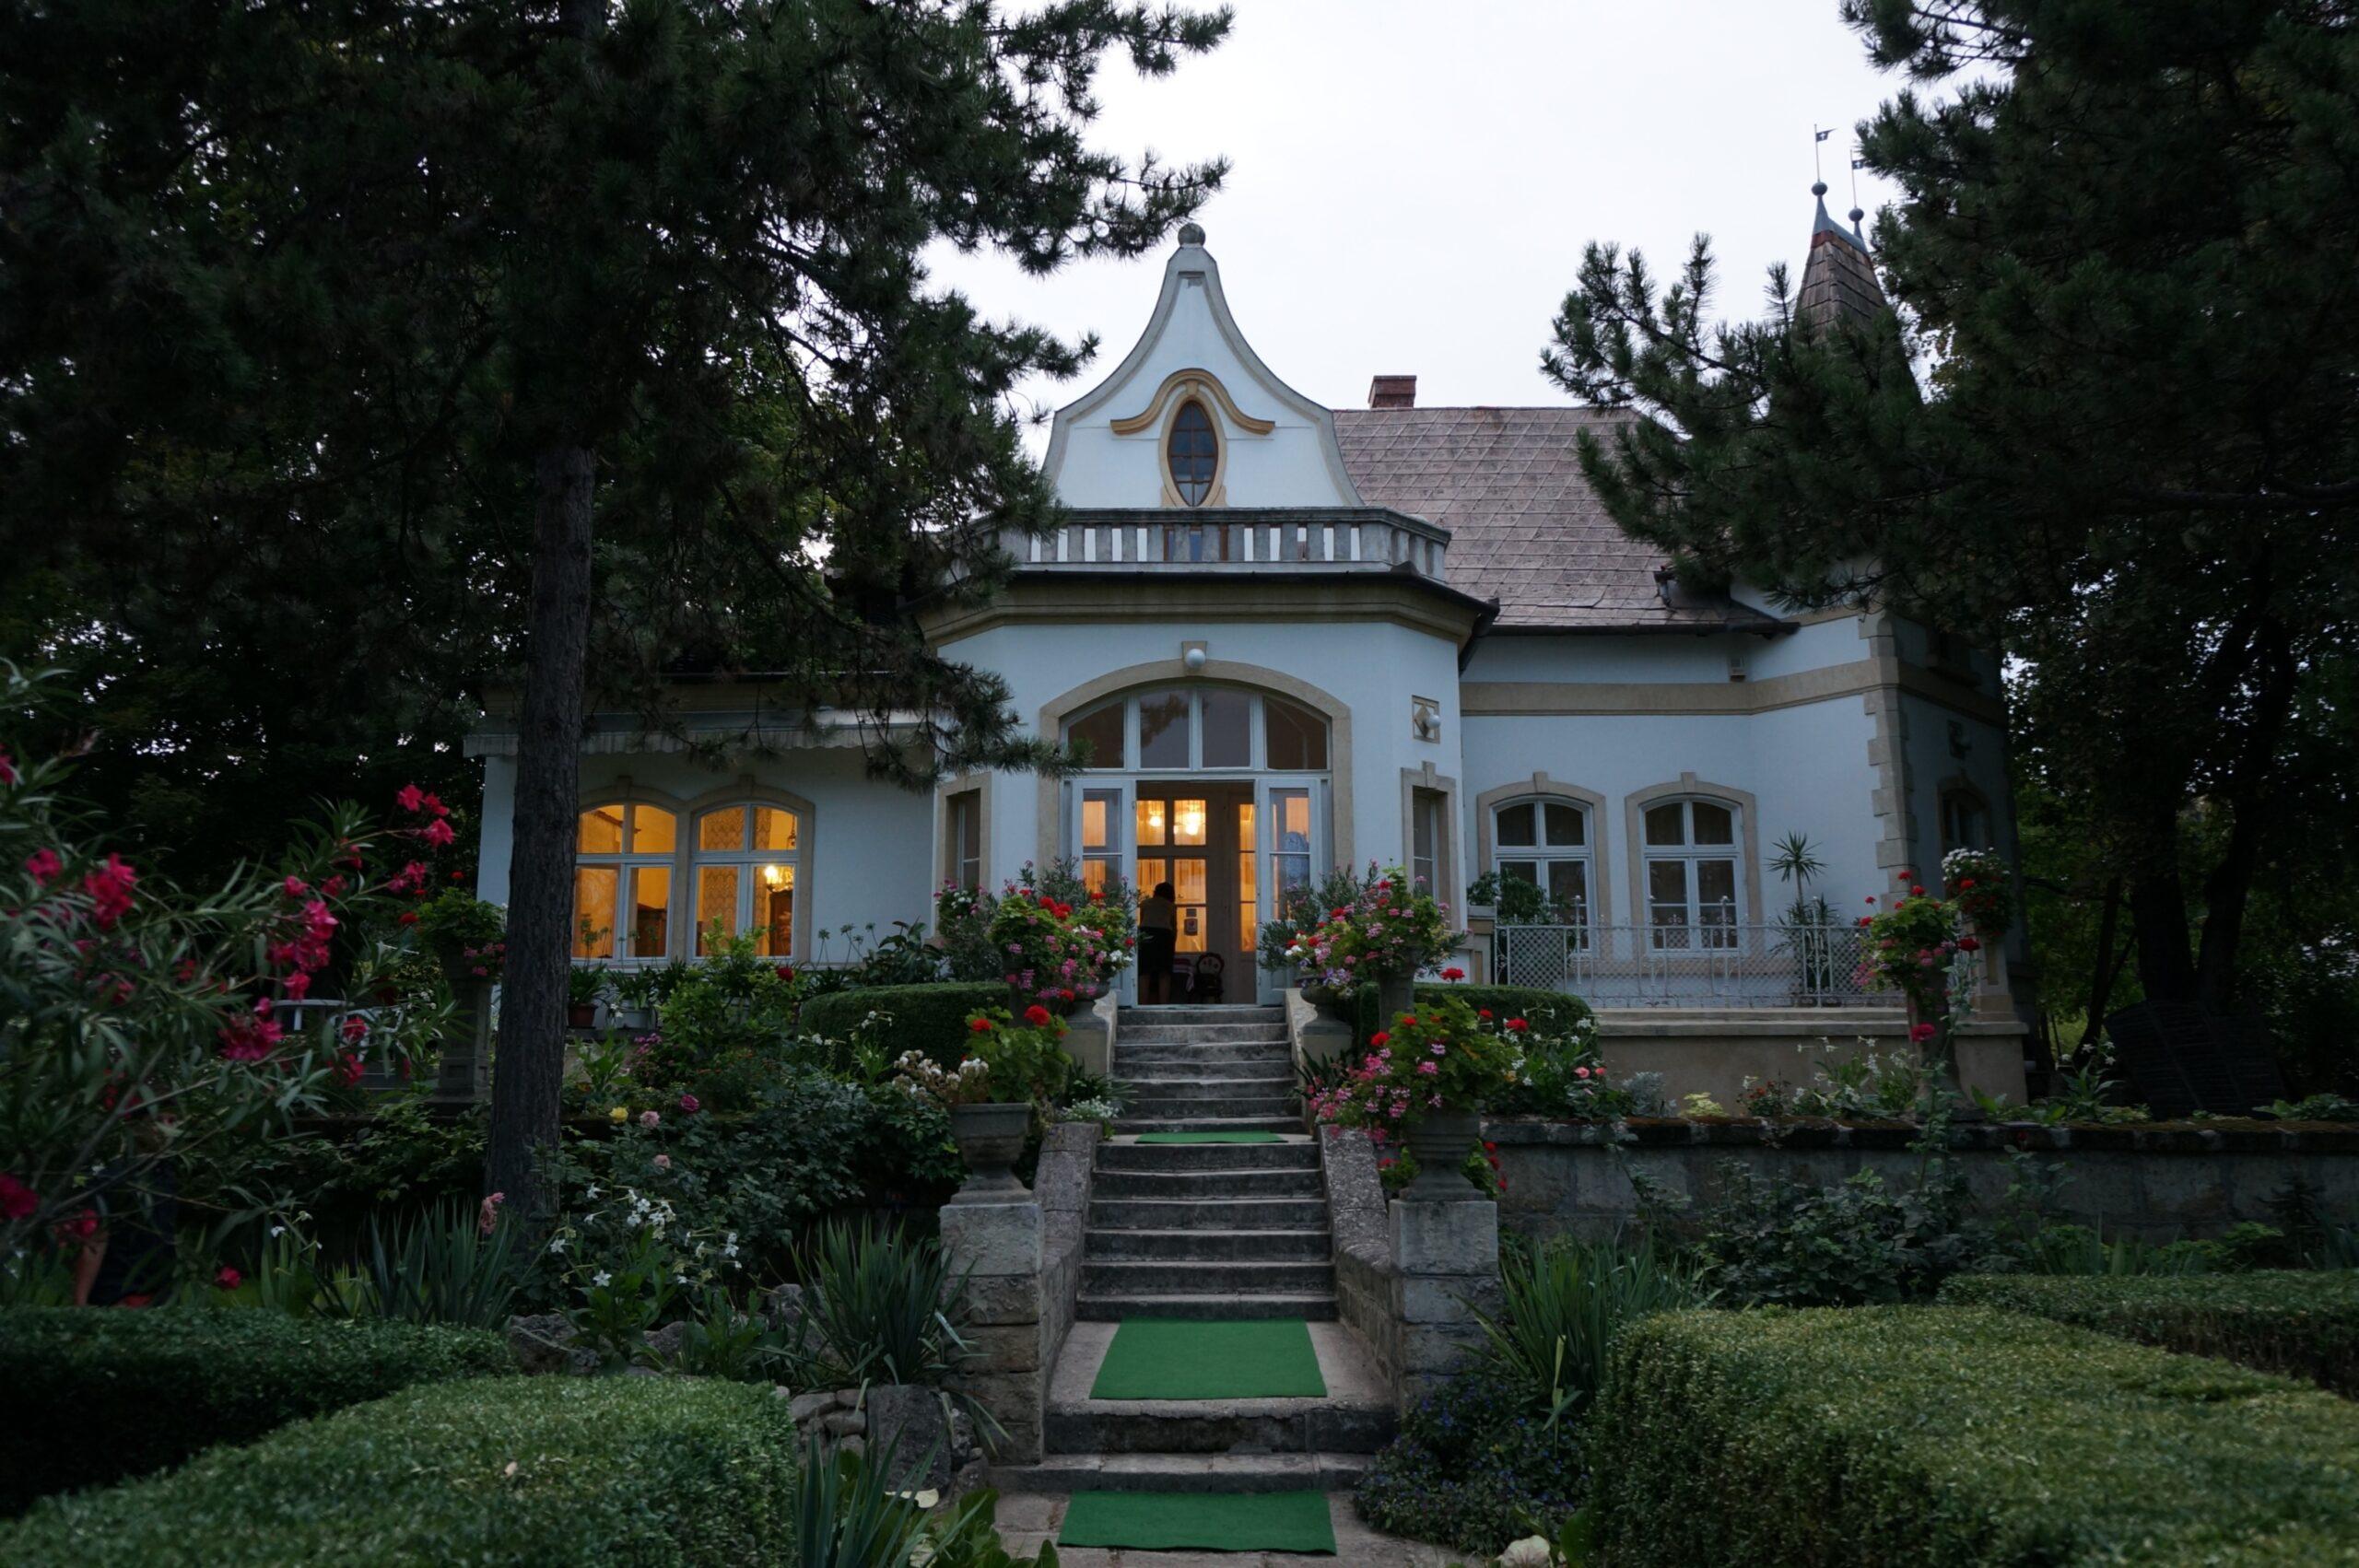 Vojnovich-Huszár Villa